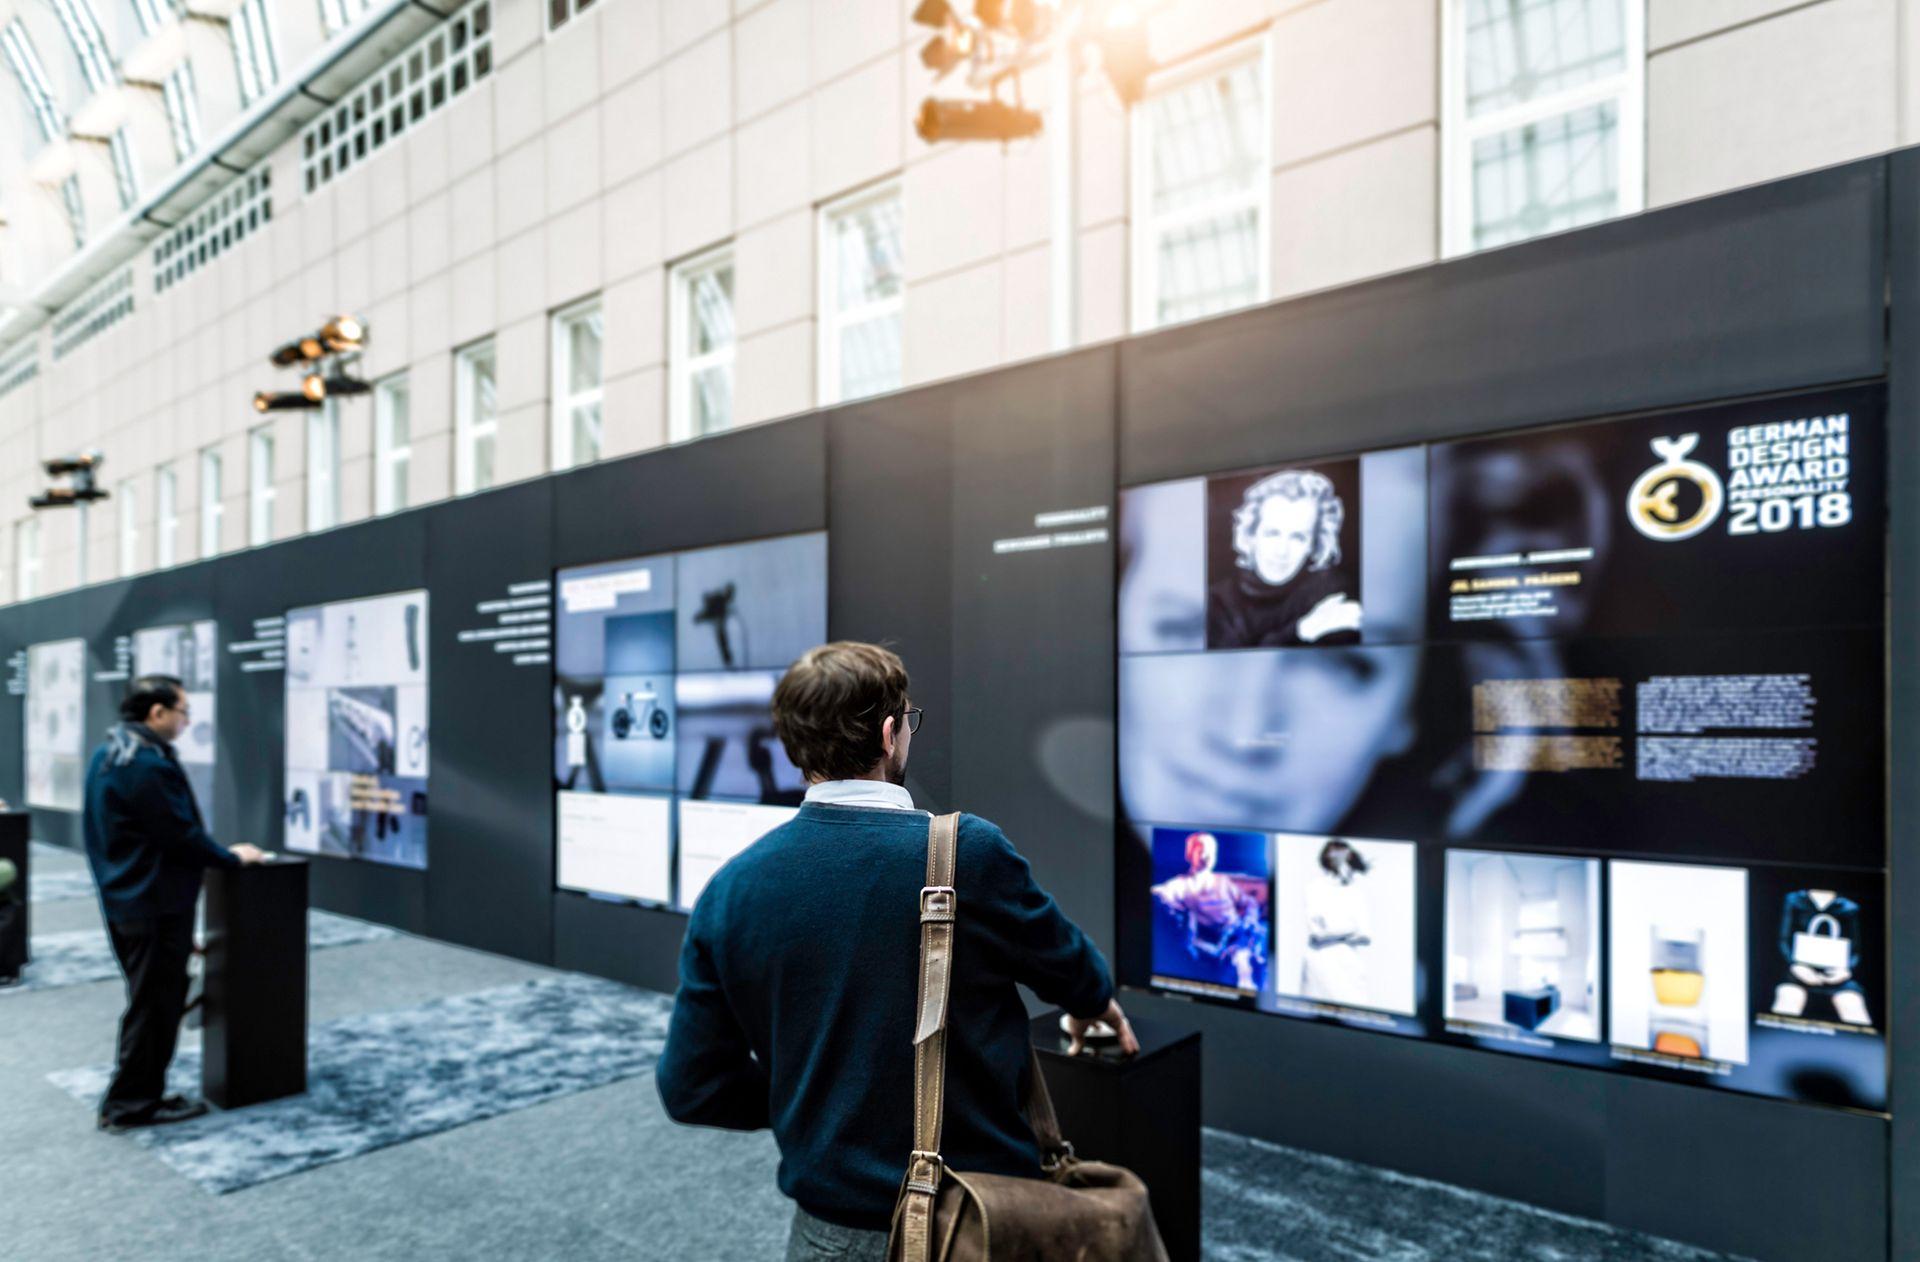 Museum Angewandte Kunst - Design Space